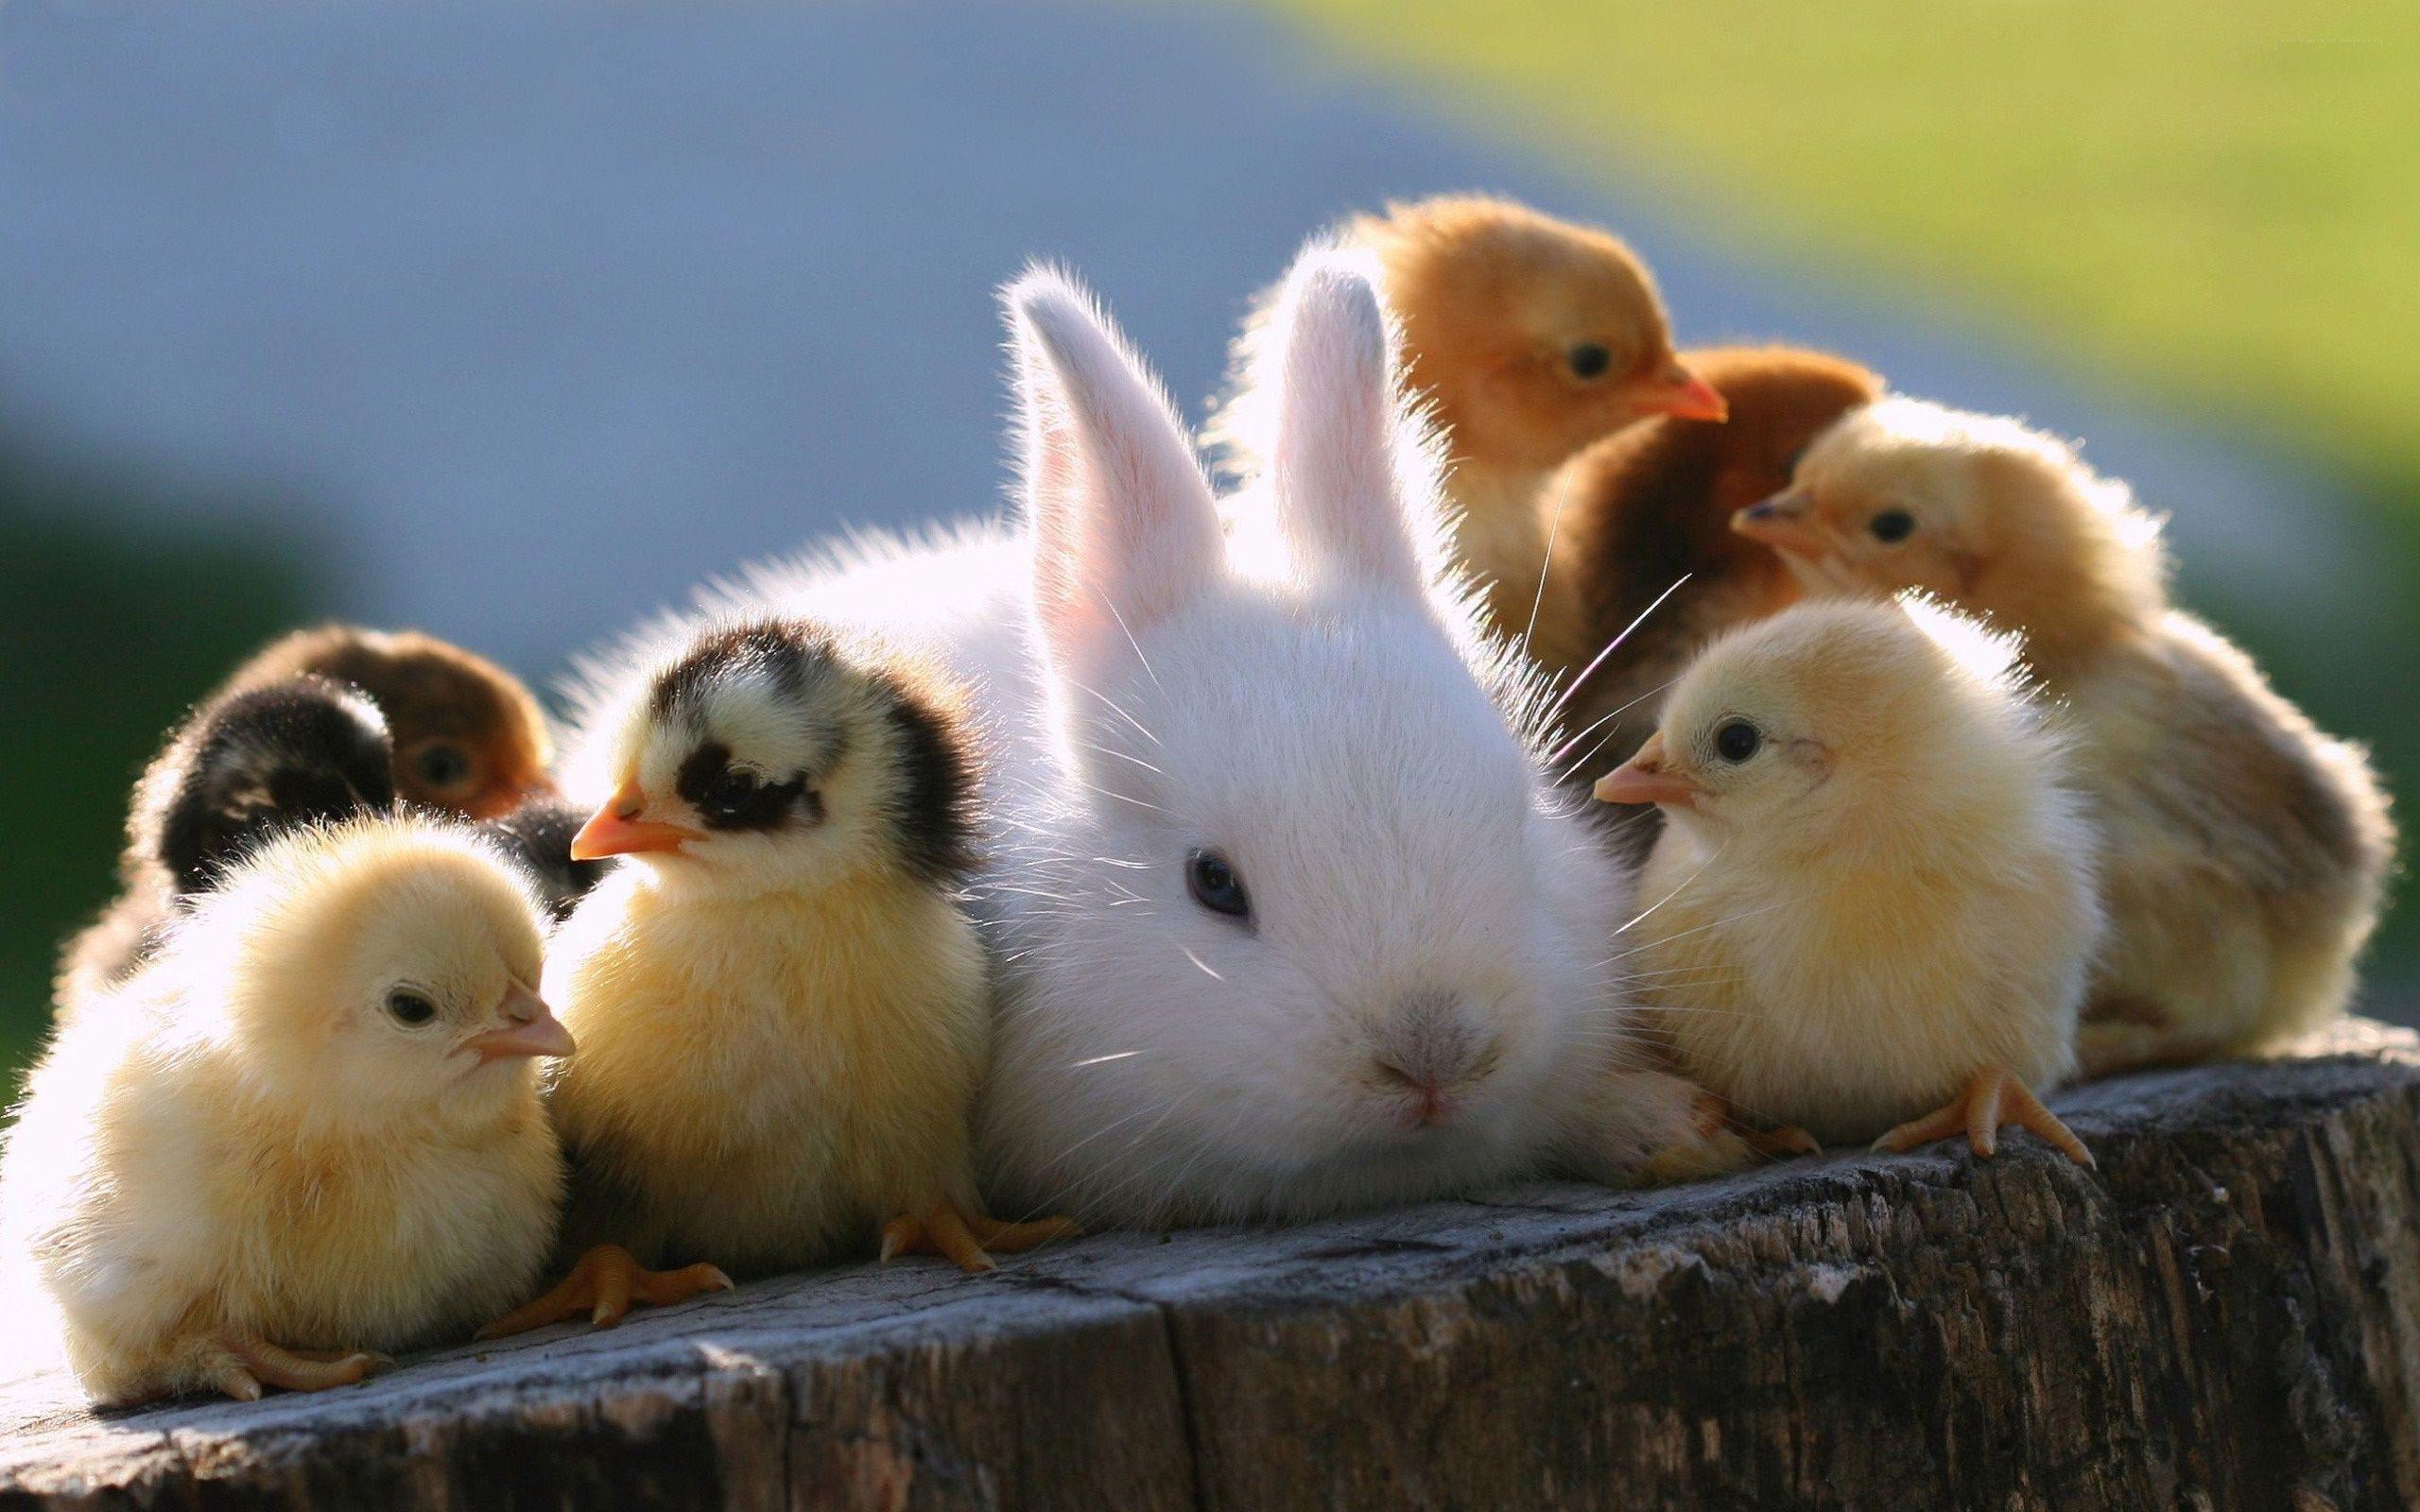 cute baby animals wallpaper - download hd cute baby animals